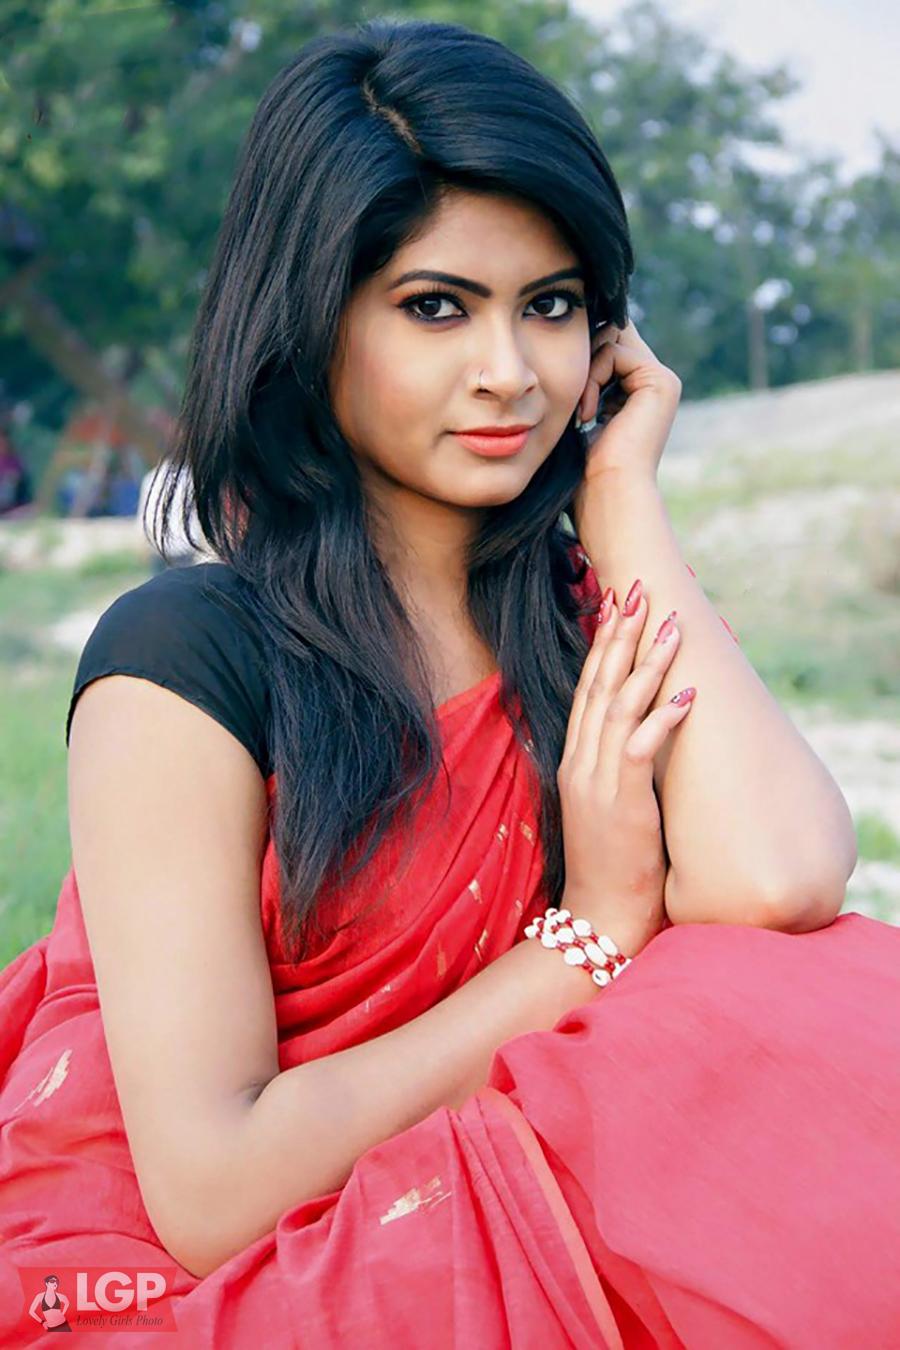 Bangla Choda Chudir Golpo       -5380